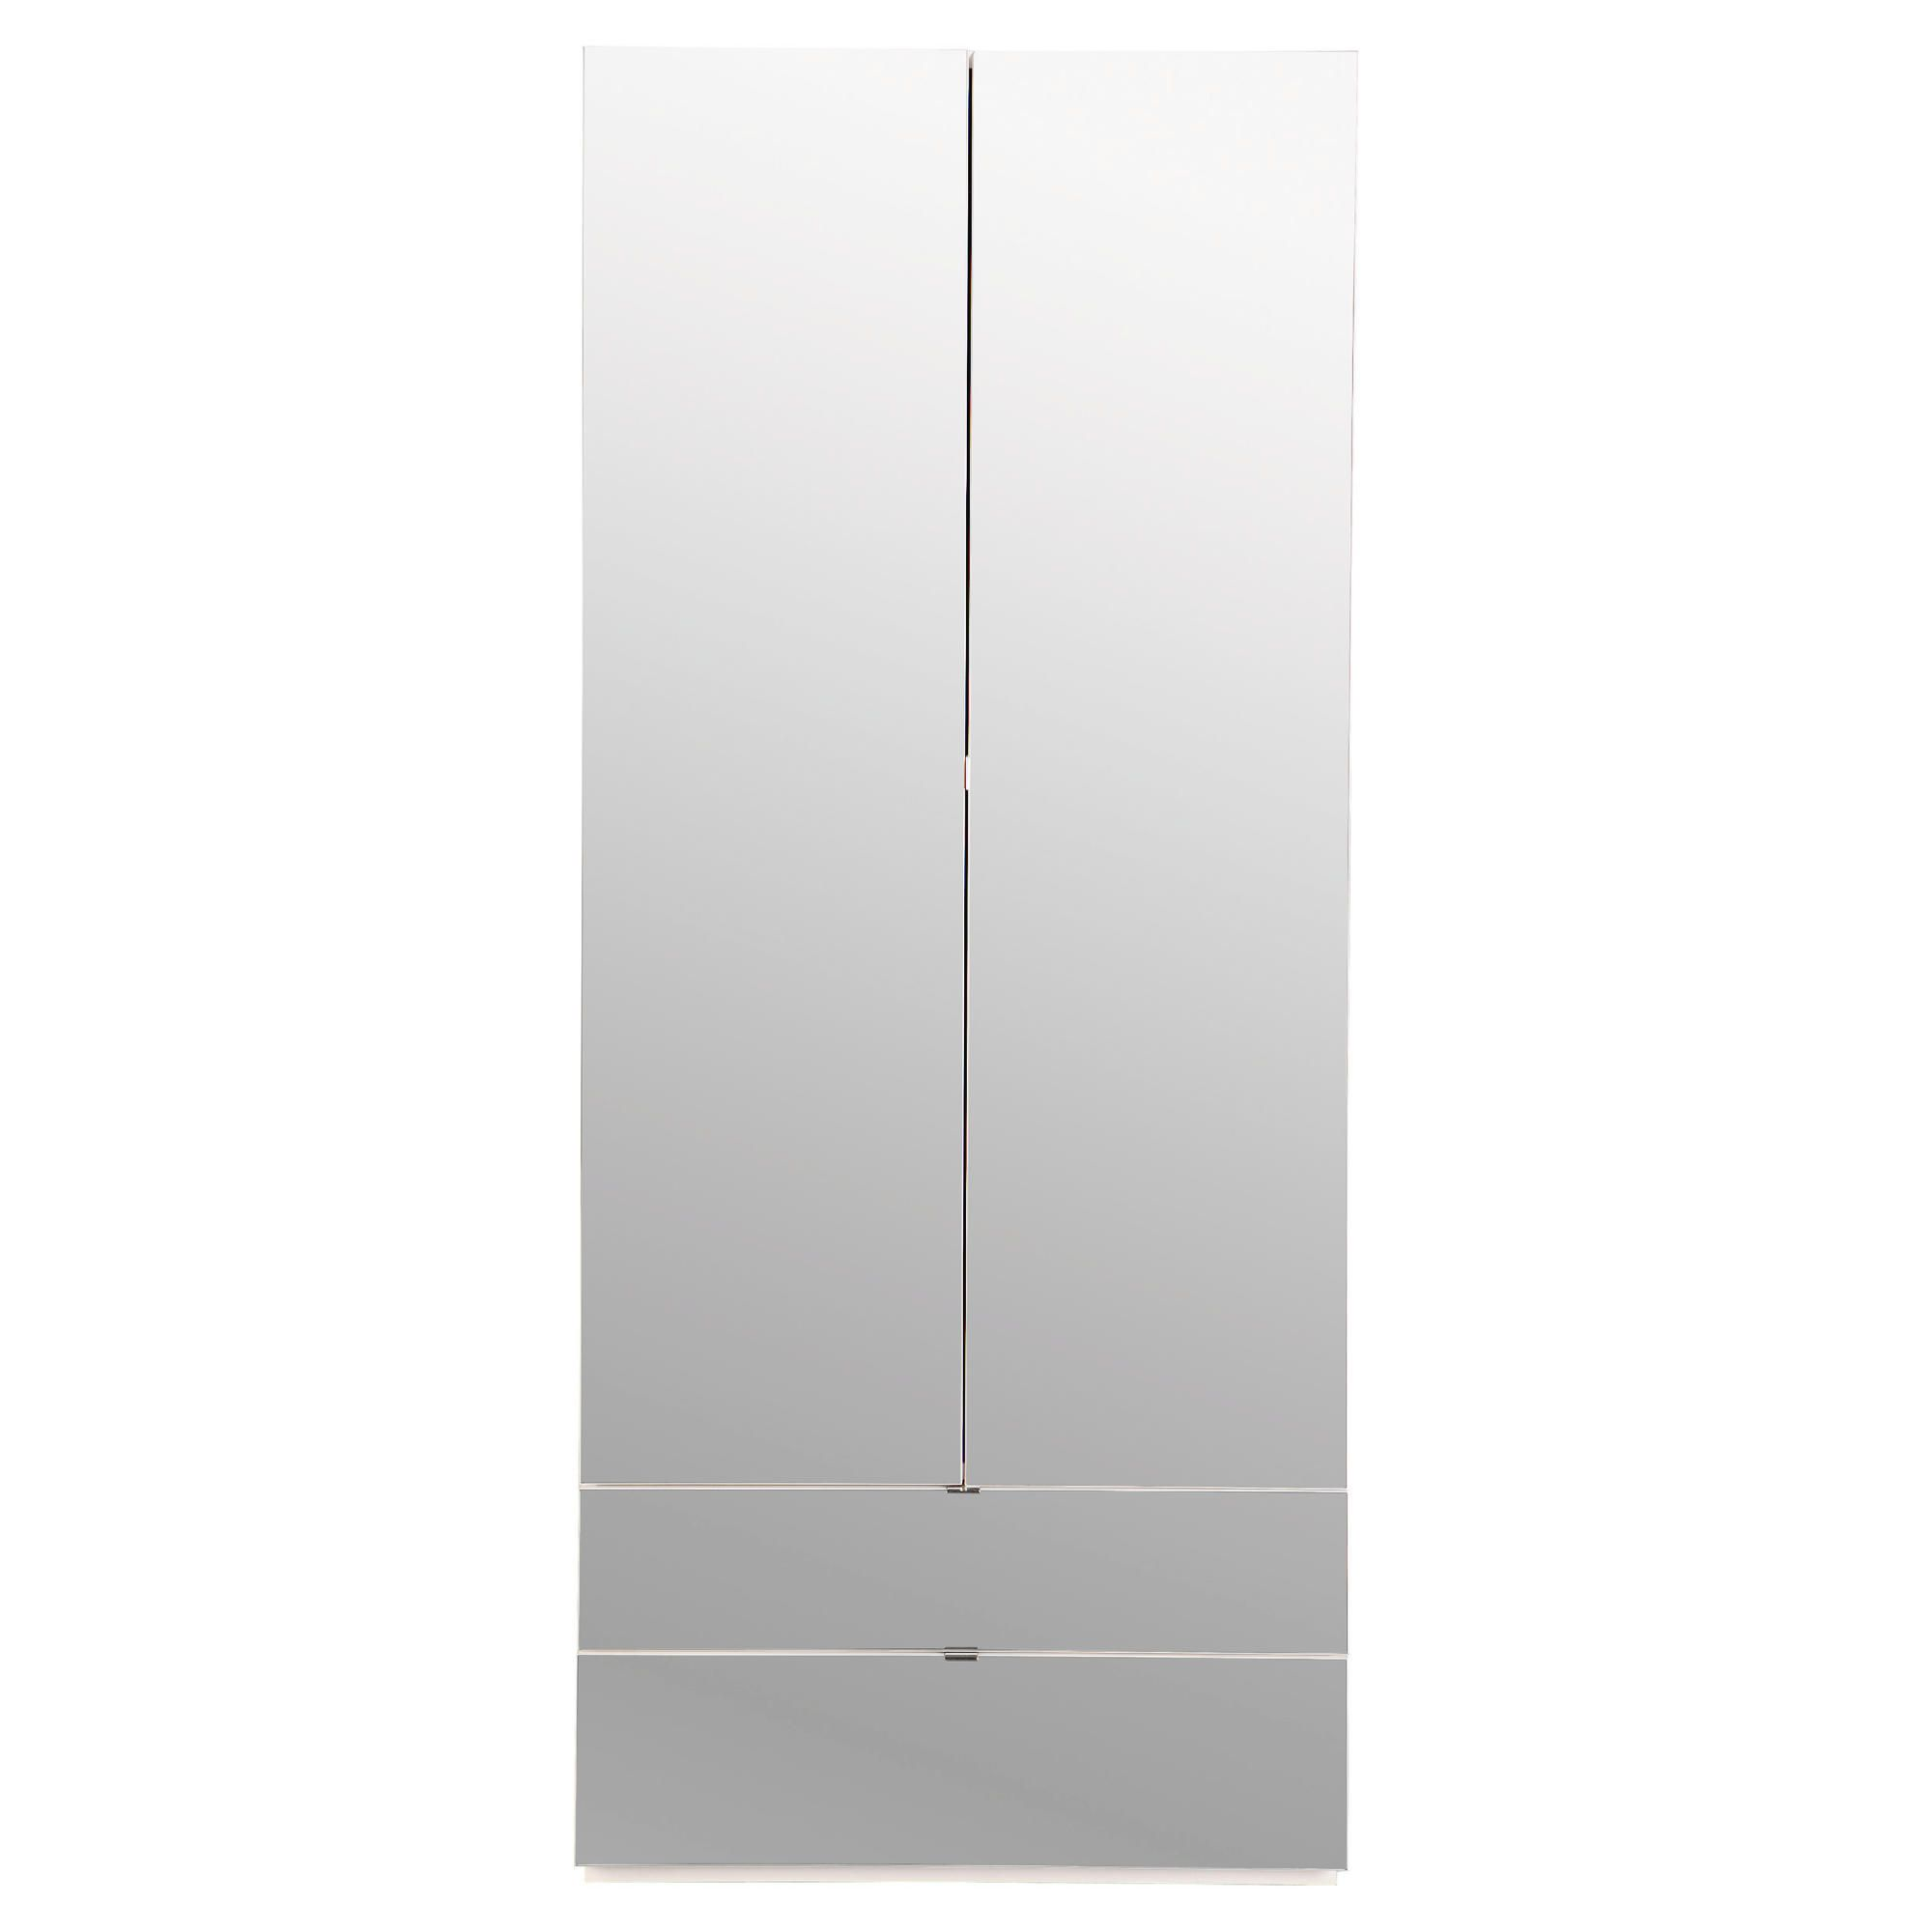 Palermo 2 Door Wardrobe White Mirrored at Tesco Direct